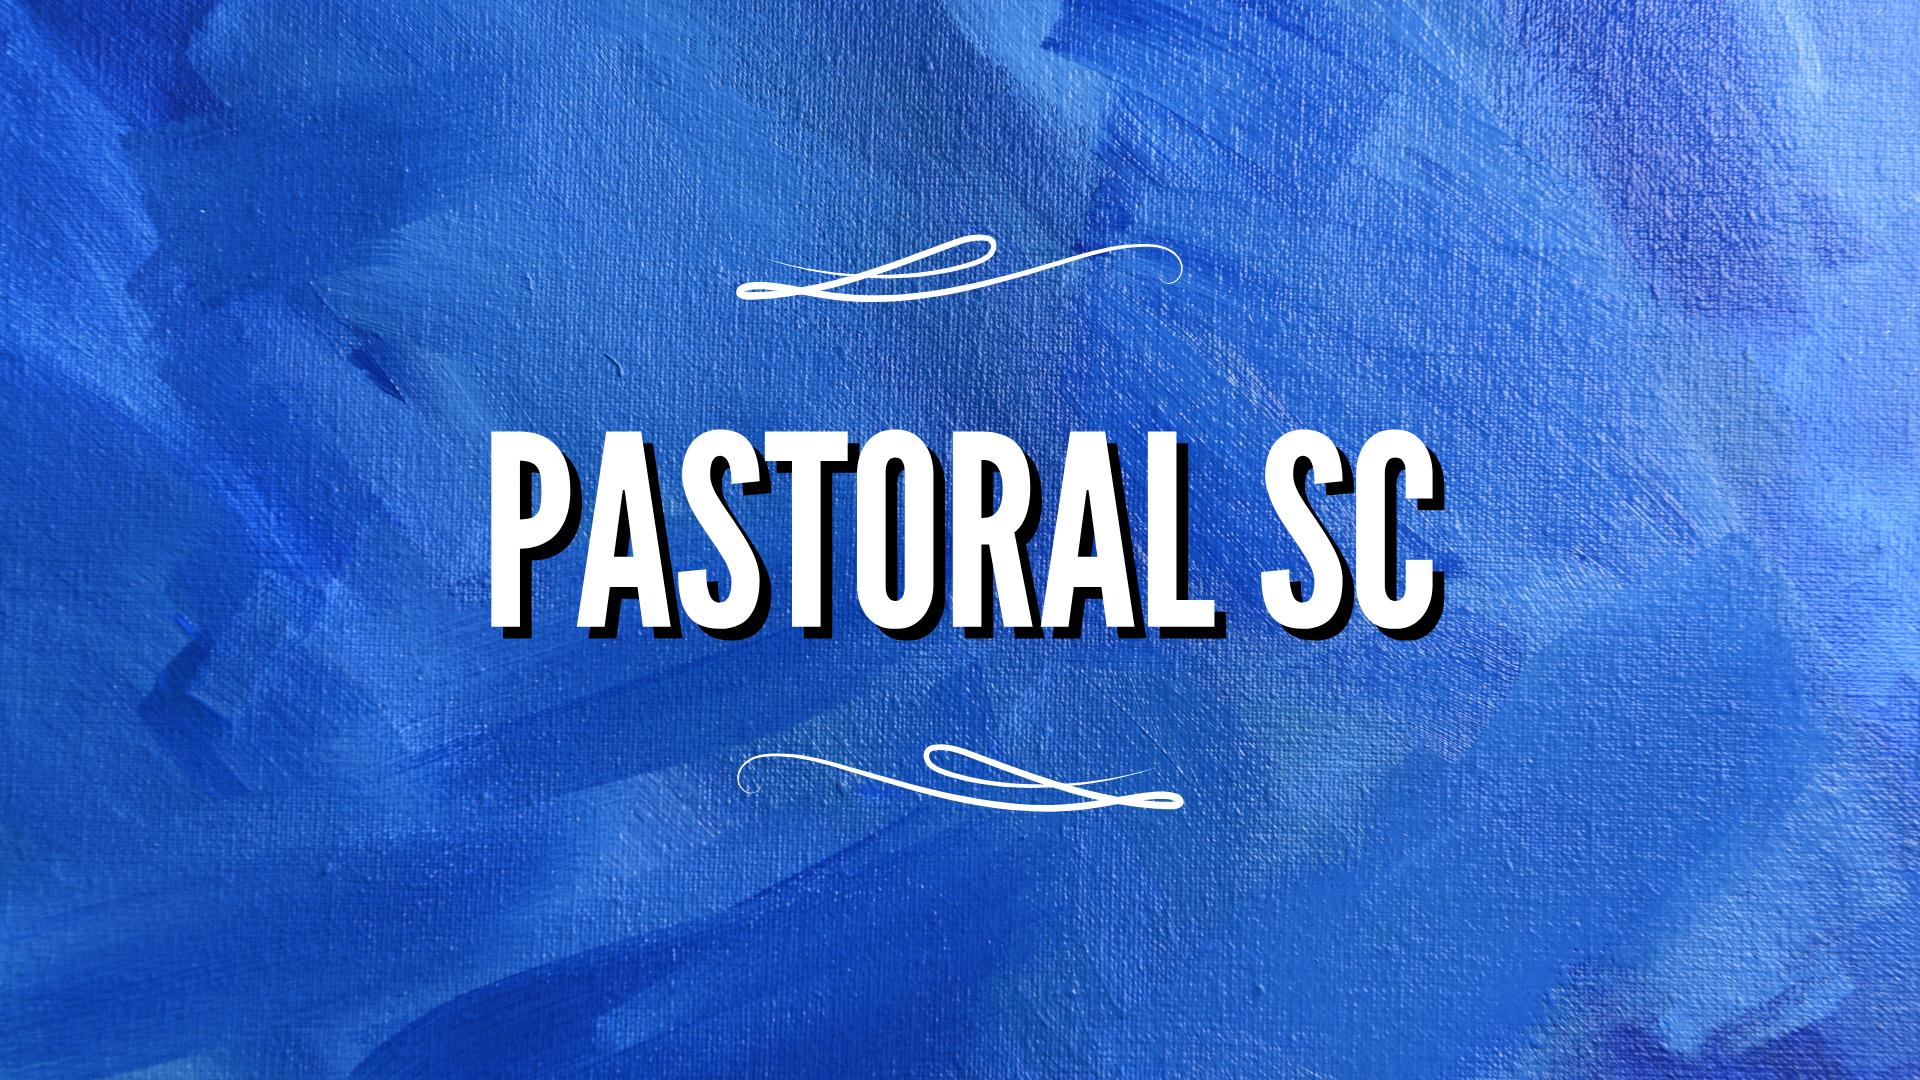 PASTORAL SC INFORMA FECHAS IMPORTANTES